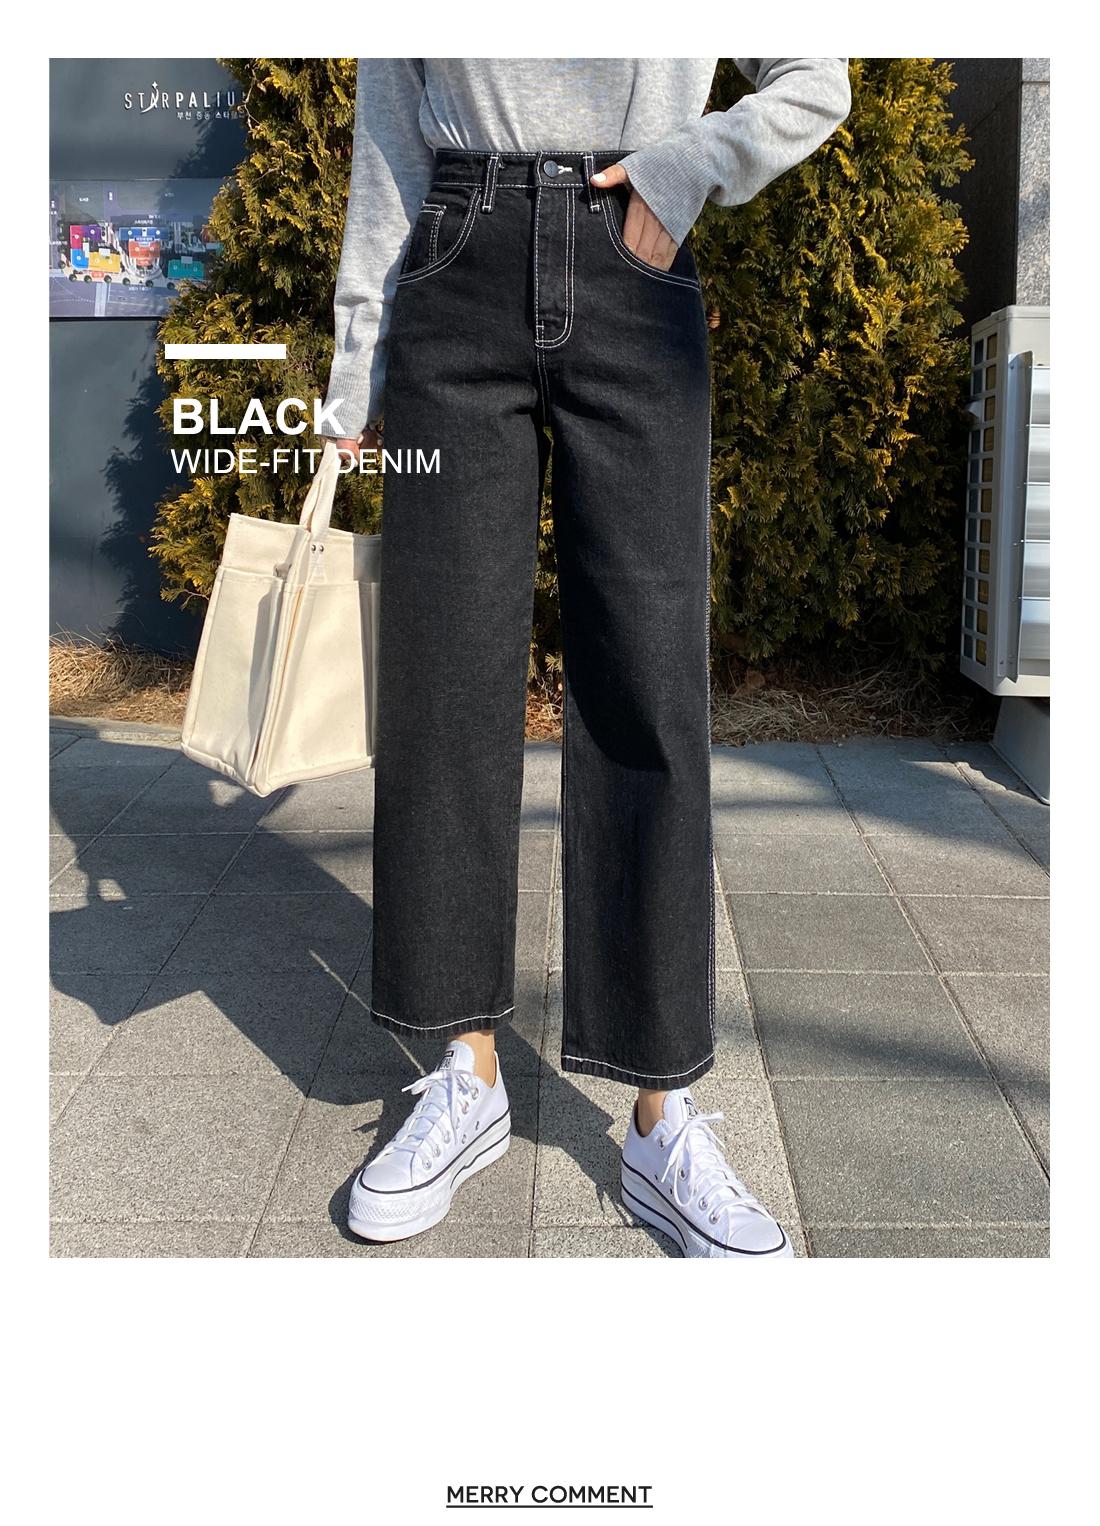 Stitch cropped wide black jeans